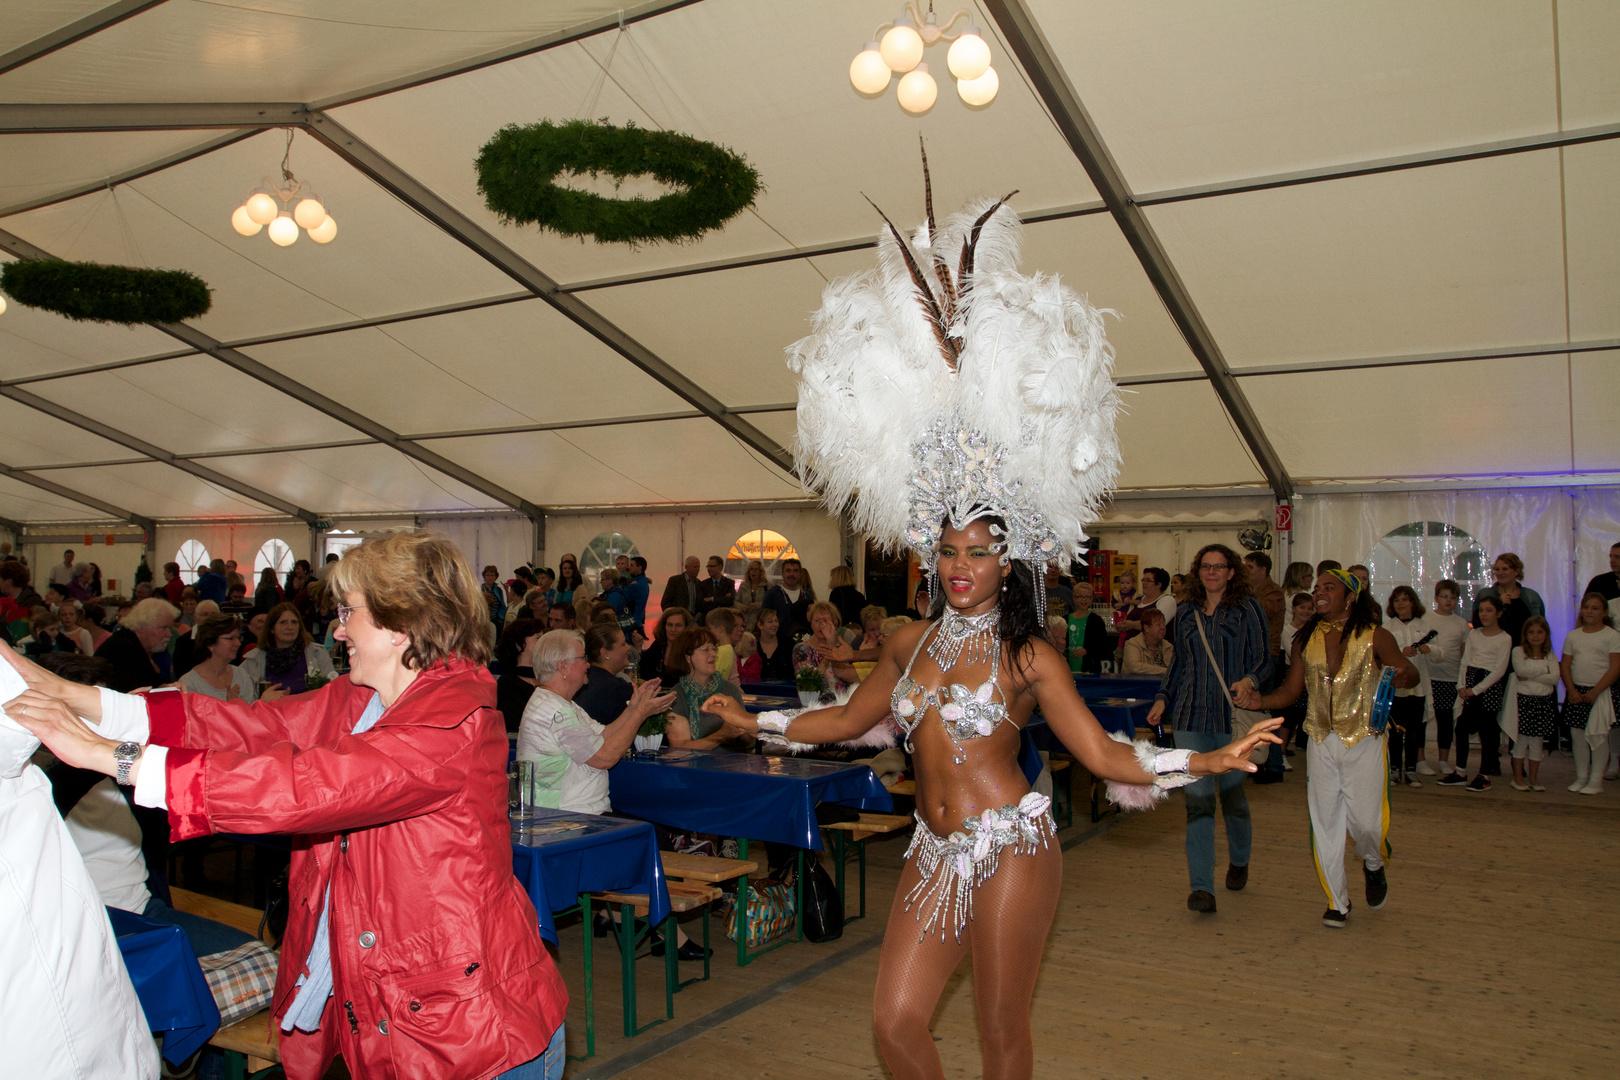 Copacabana-Sambashow Nr. 4656